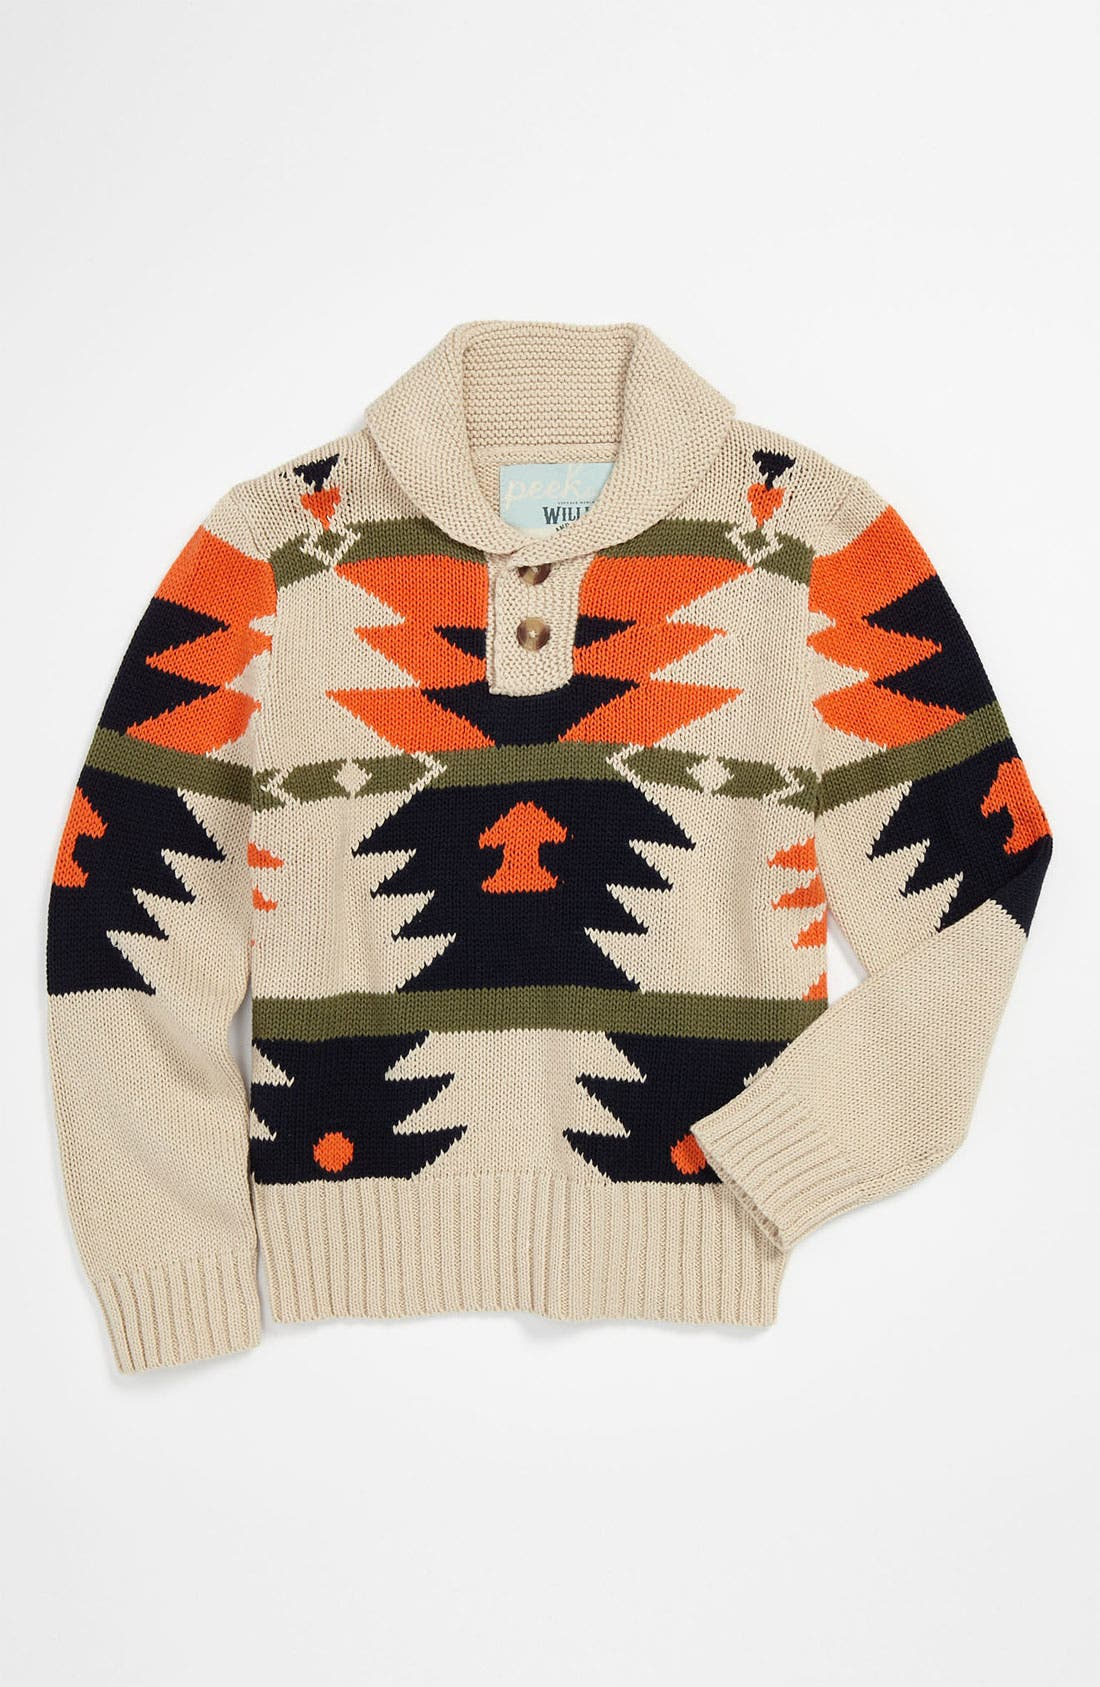 Alternate Image 1 Selected - Peek 'Arroyo' Shawl Collar Sweater (Toddler, Little Boys & Big Boys)